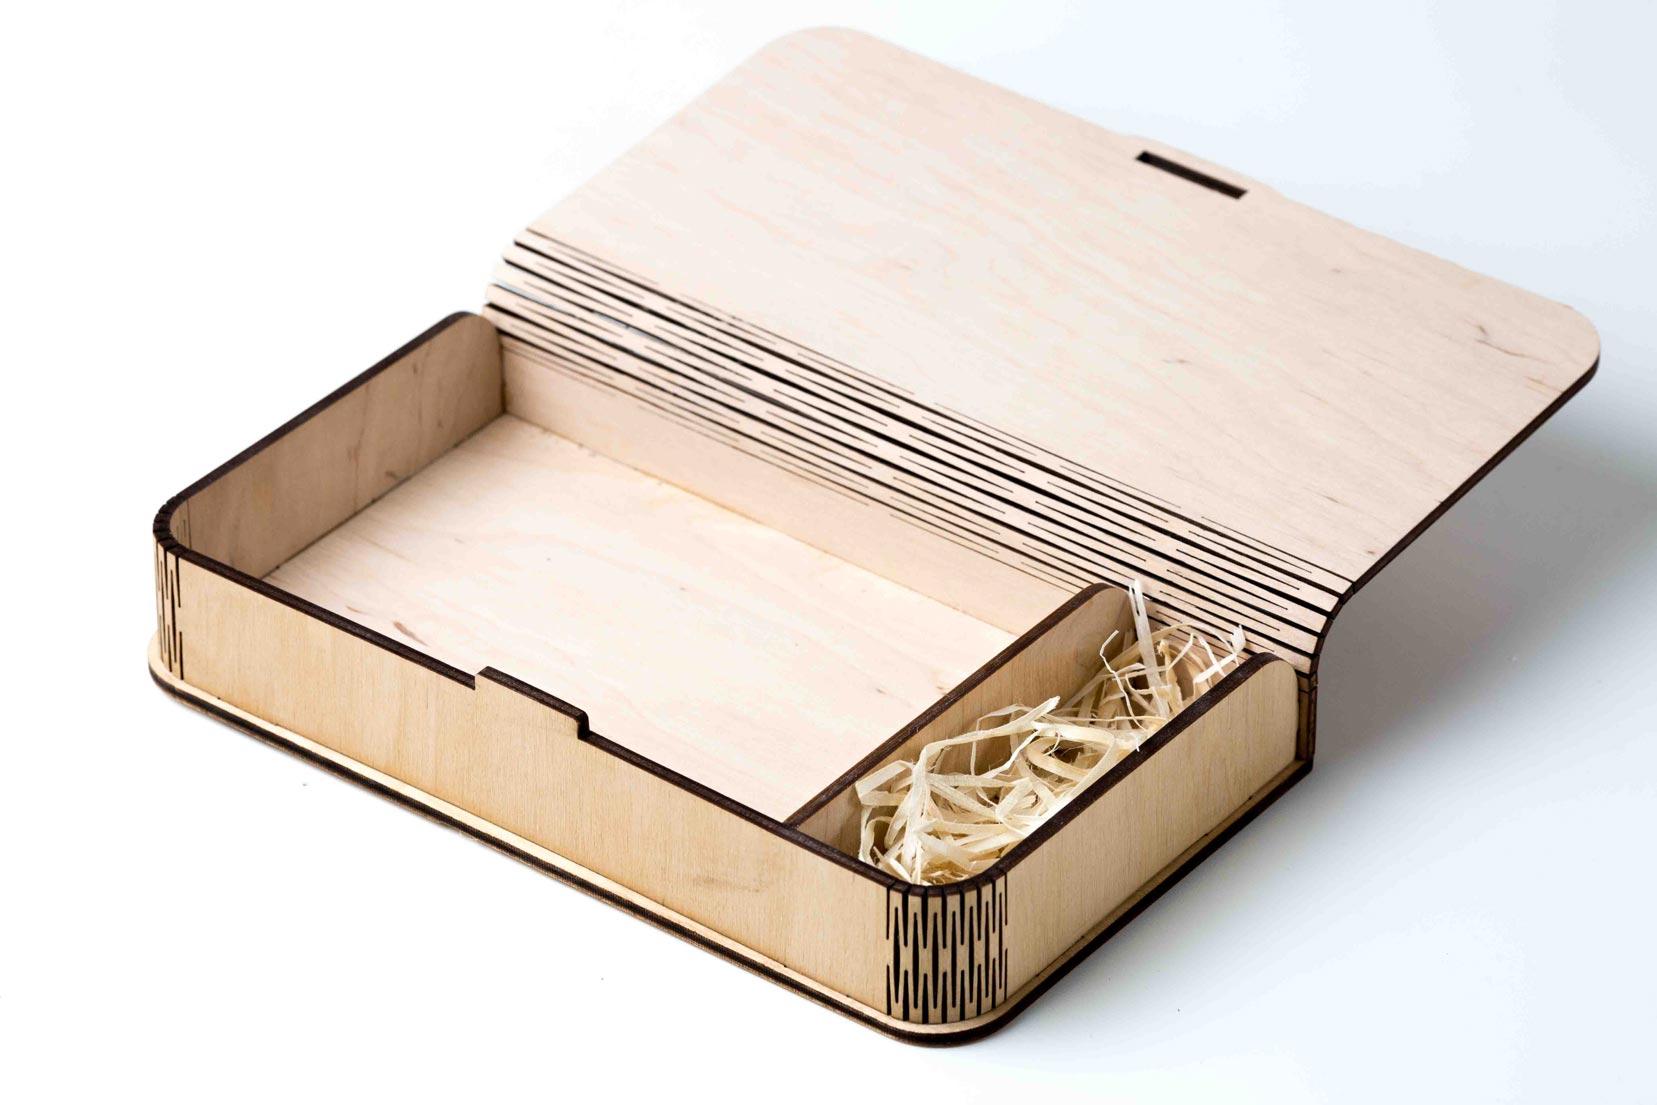 BOX DXF file